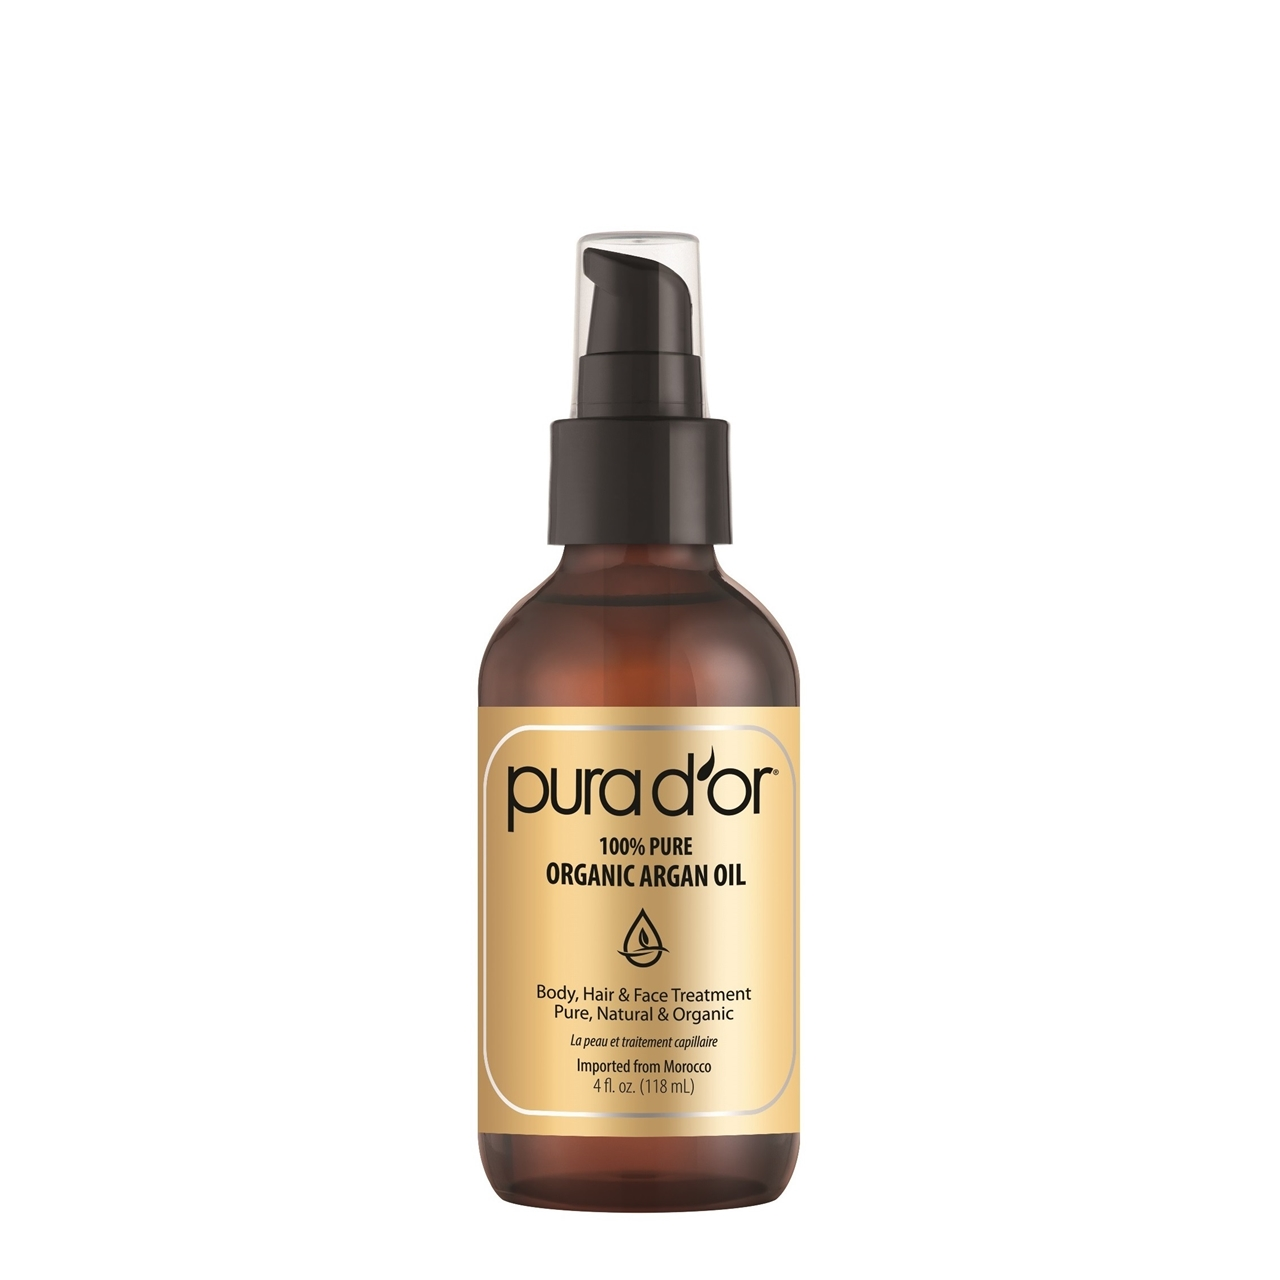 PURA D'OR 100% Argan Oil